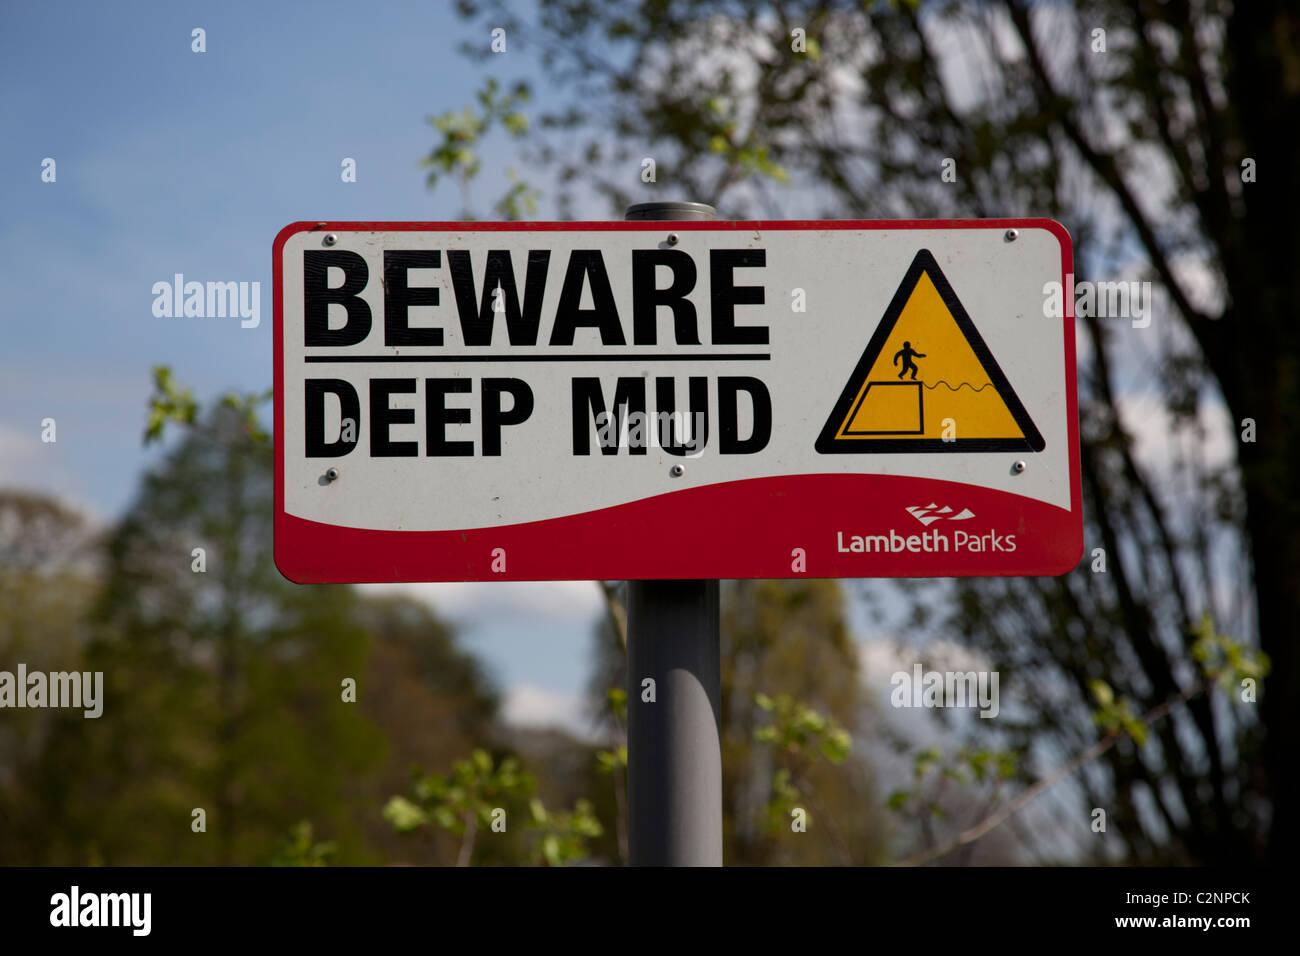 deep mud stockfotos deep mud bilder alamy. Black Bedroom Furniture Sets. Home Design Ideas